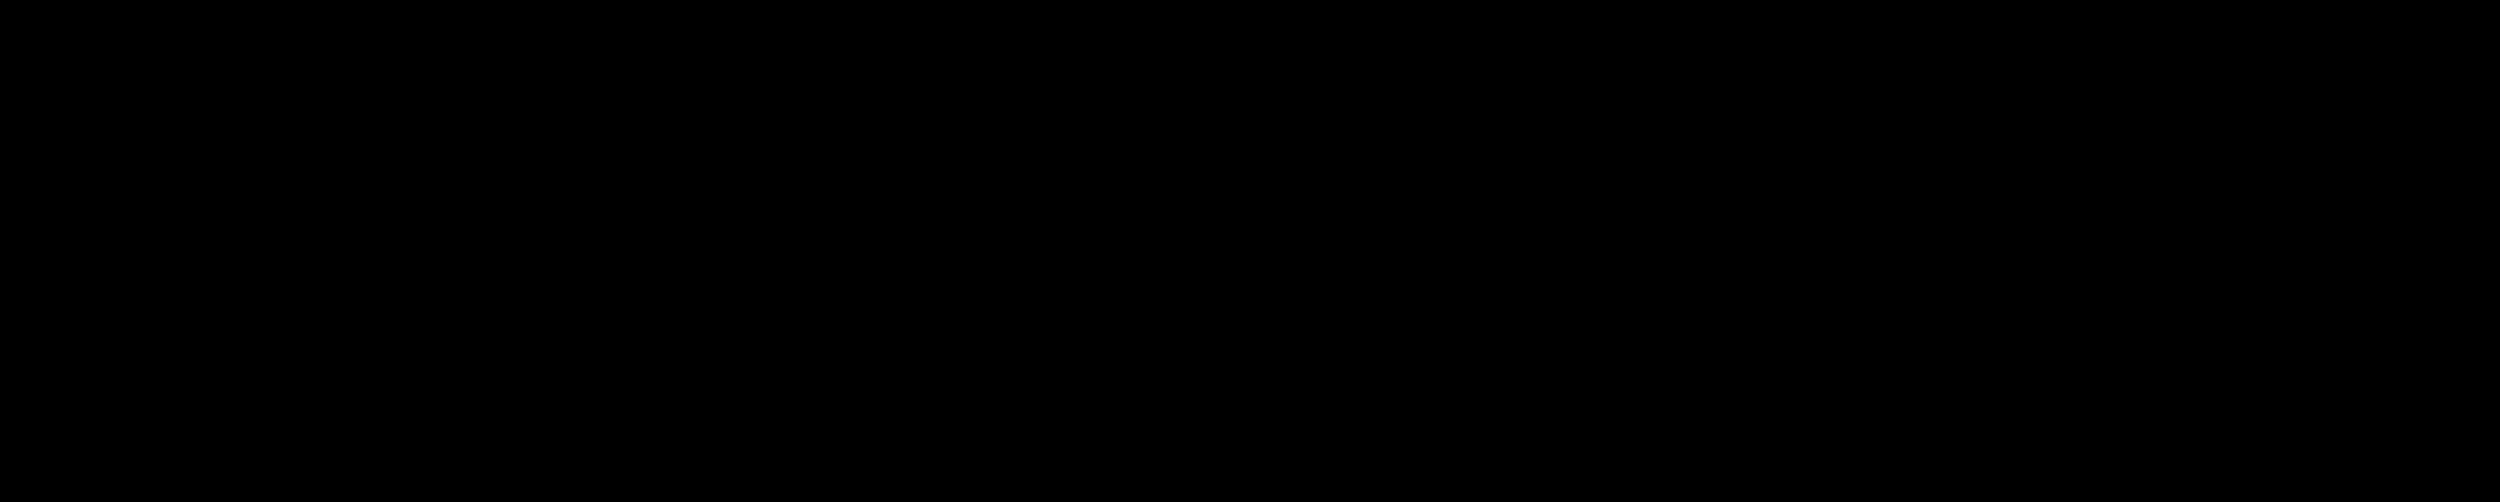 Xperia_logo_logotype.png